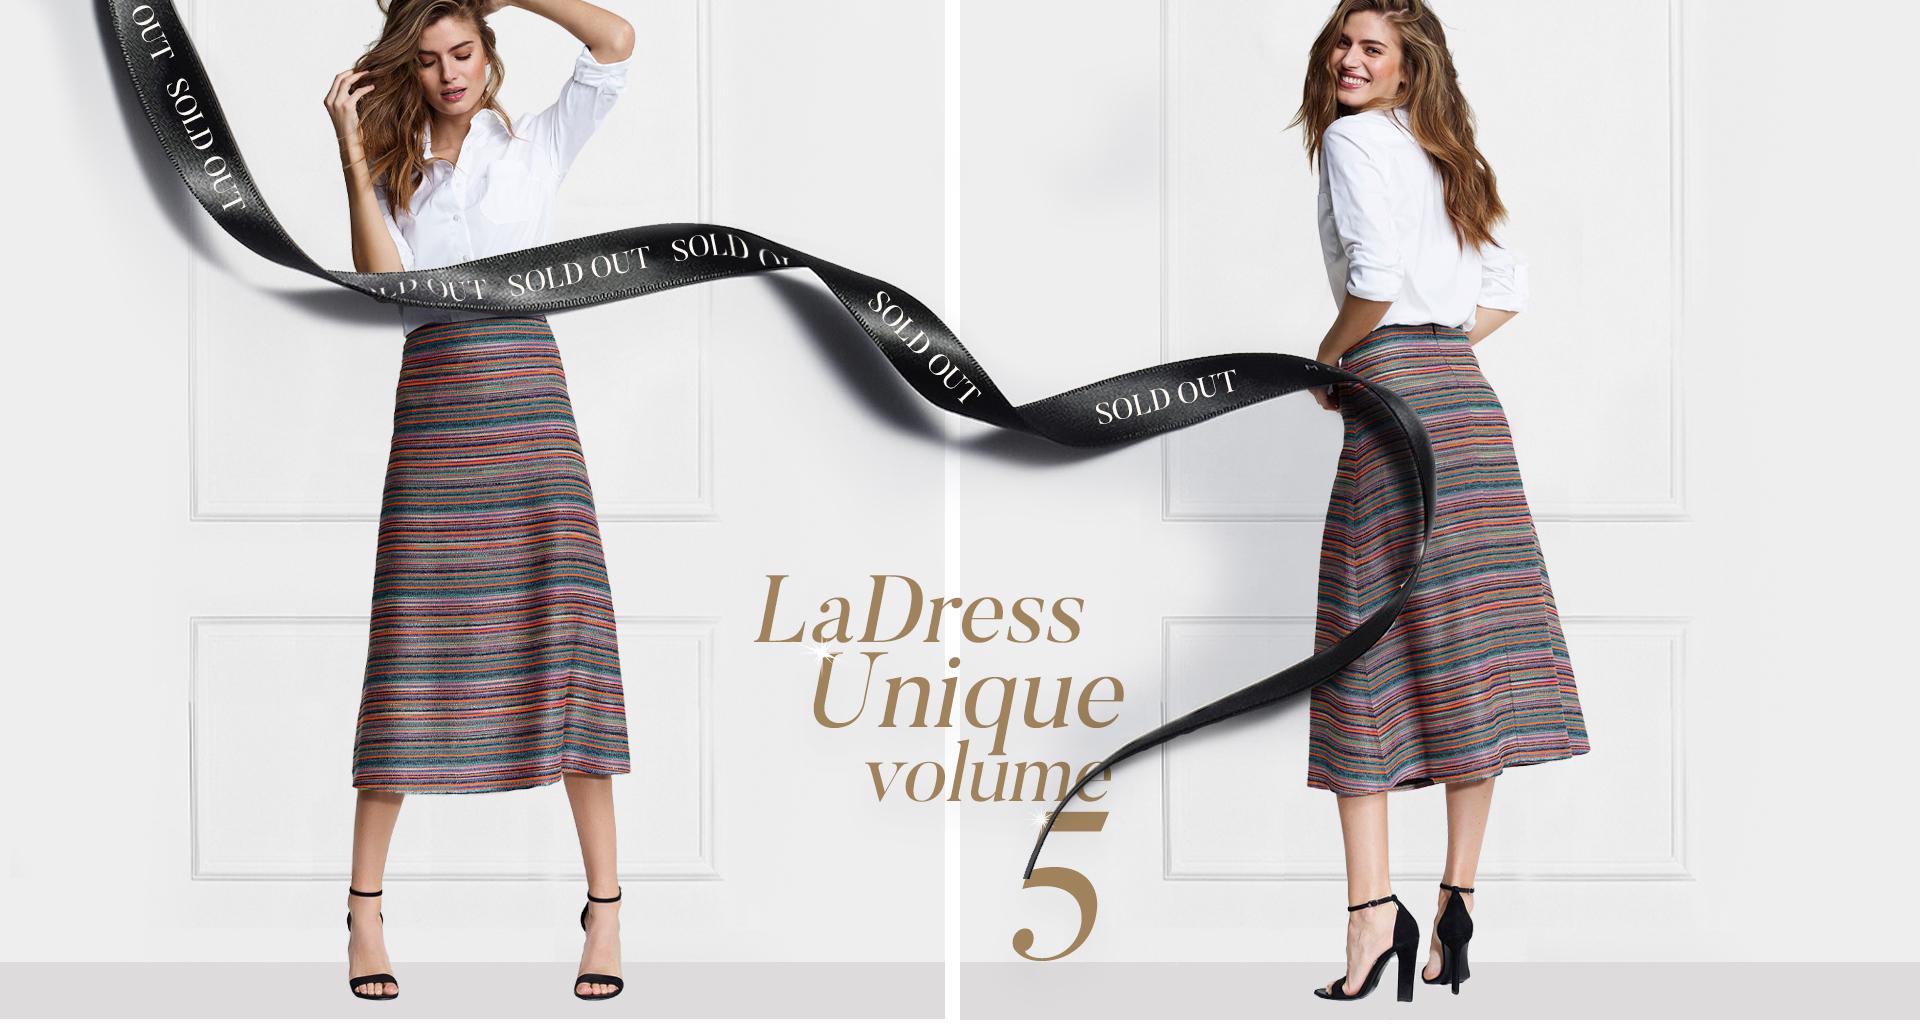 LaDress Unique